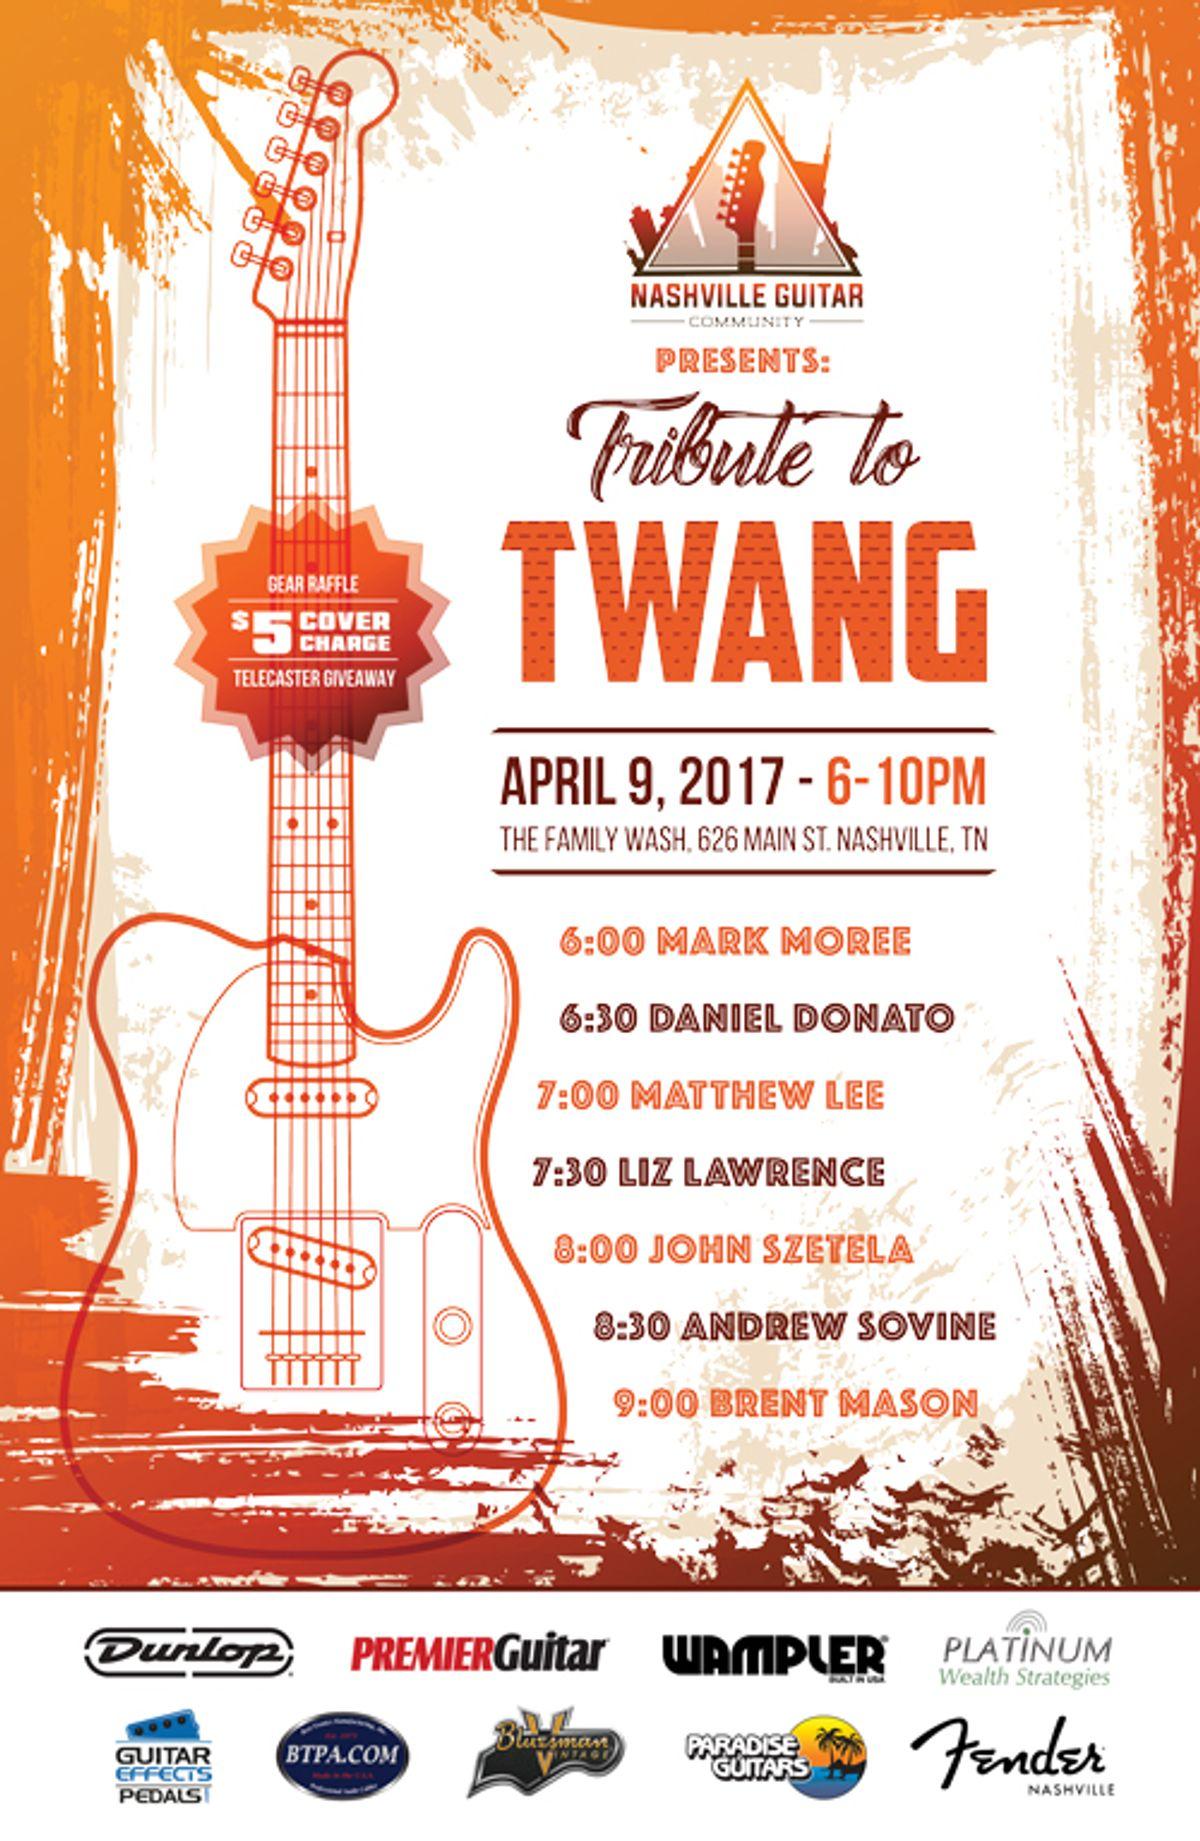 Nashville Guitar Community Presents Tribute to Twang